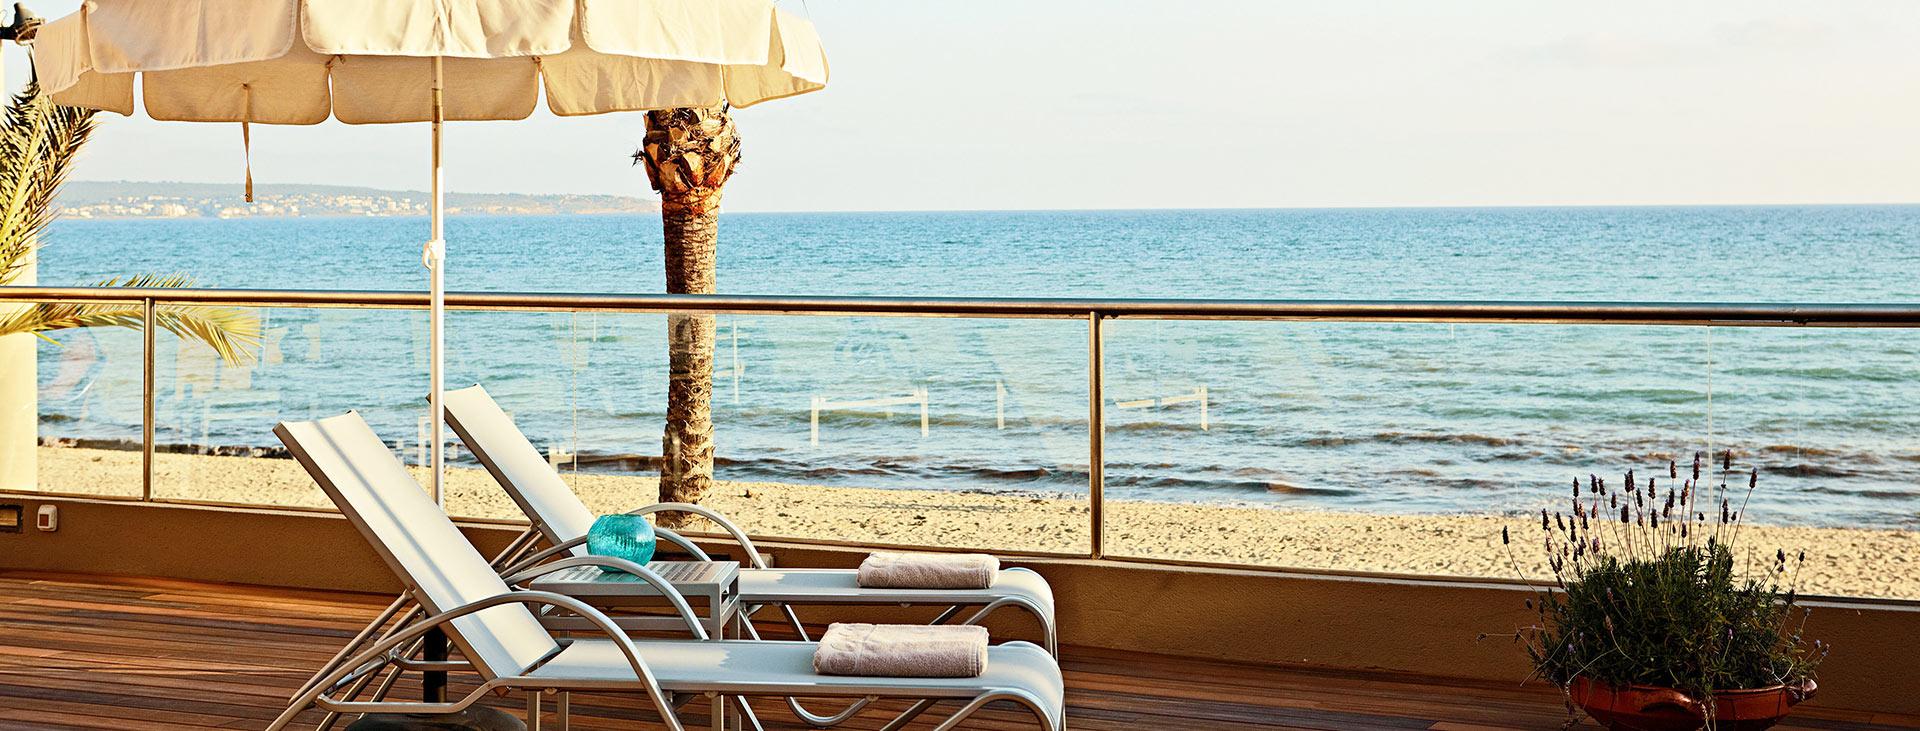 Sunprime Palma Beach, Playa de Palma, Mallorca, Spanien